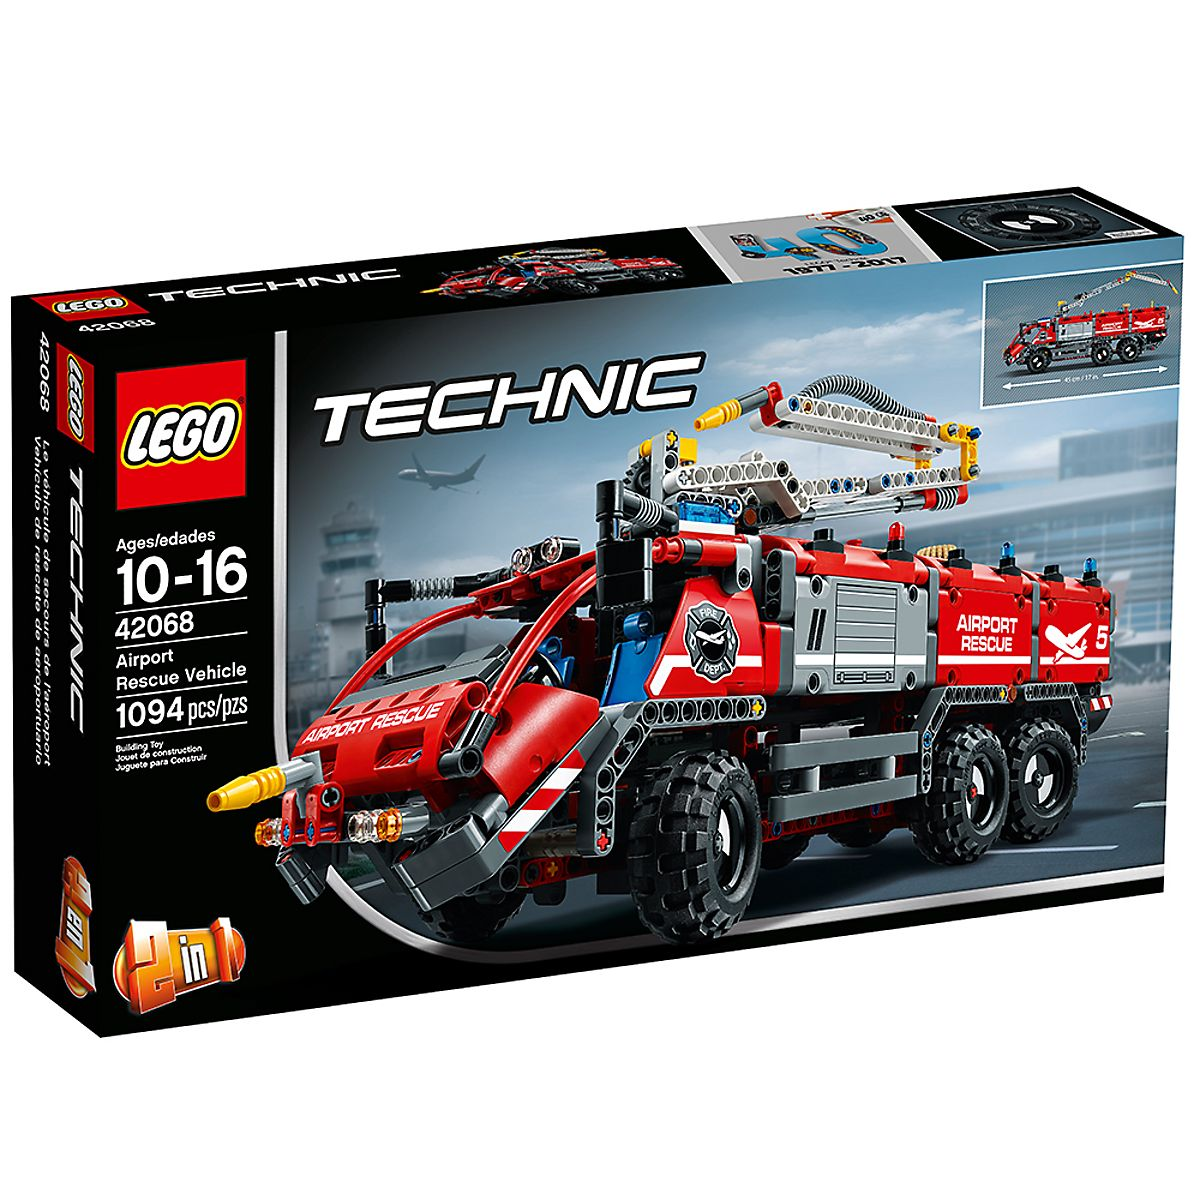 Lego Technic Power Functions Tuning Set Günstig Kaufen 8293